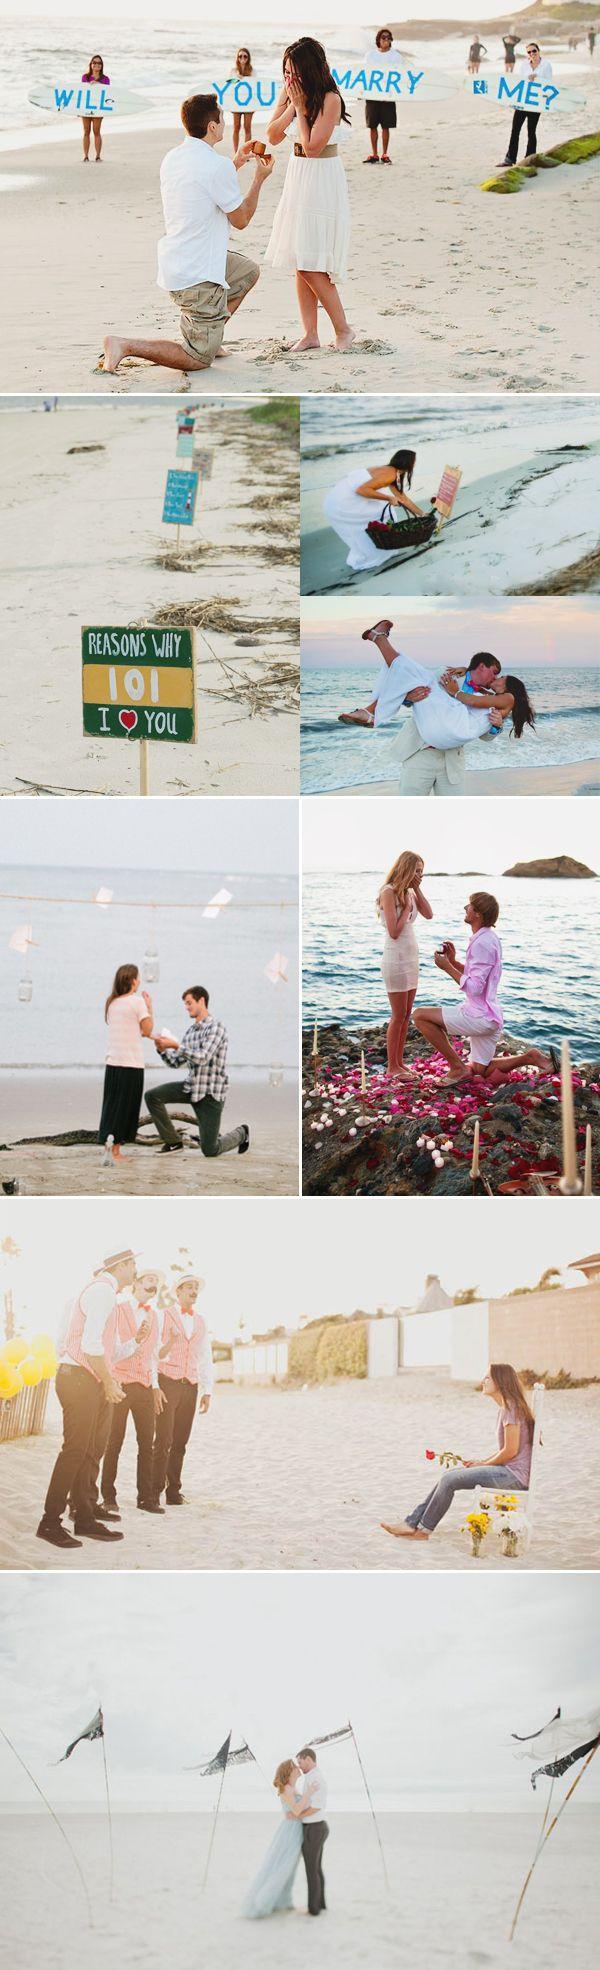 Cool Wedding Proposal Ideas